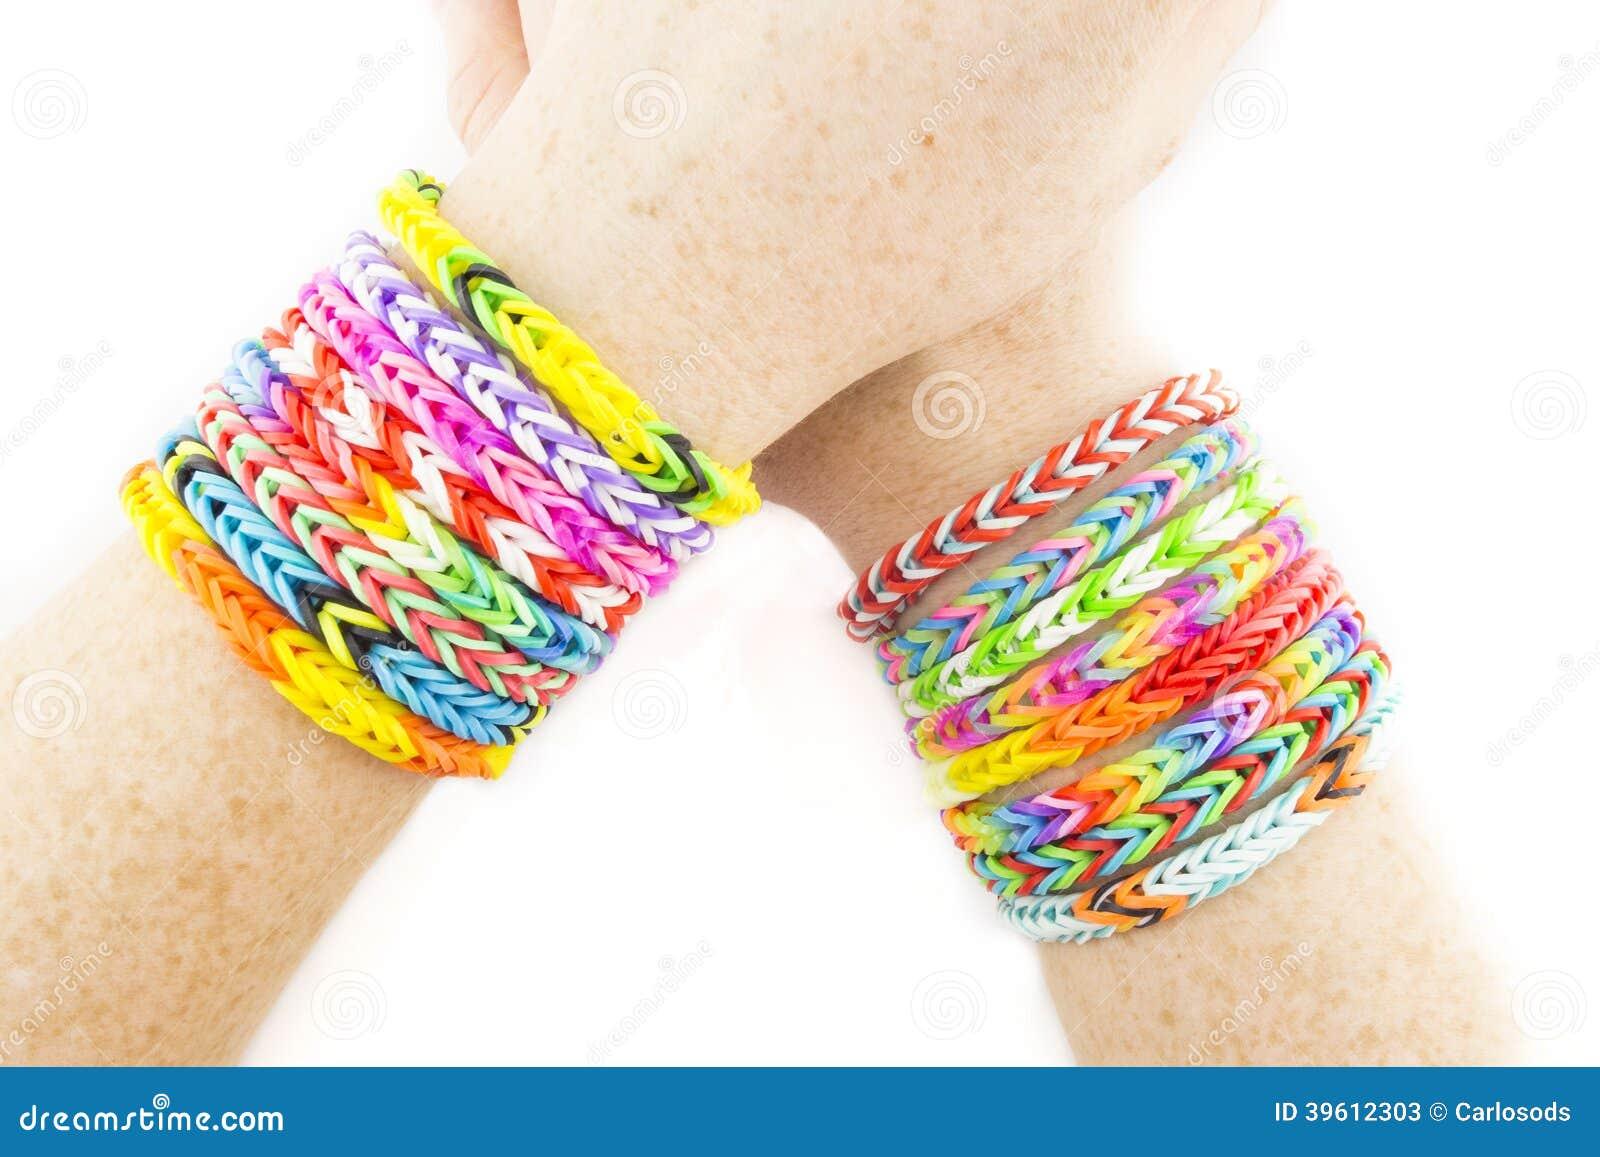 Rubber Bands Bracelets Stock Photos